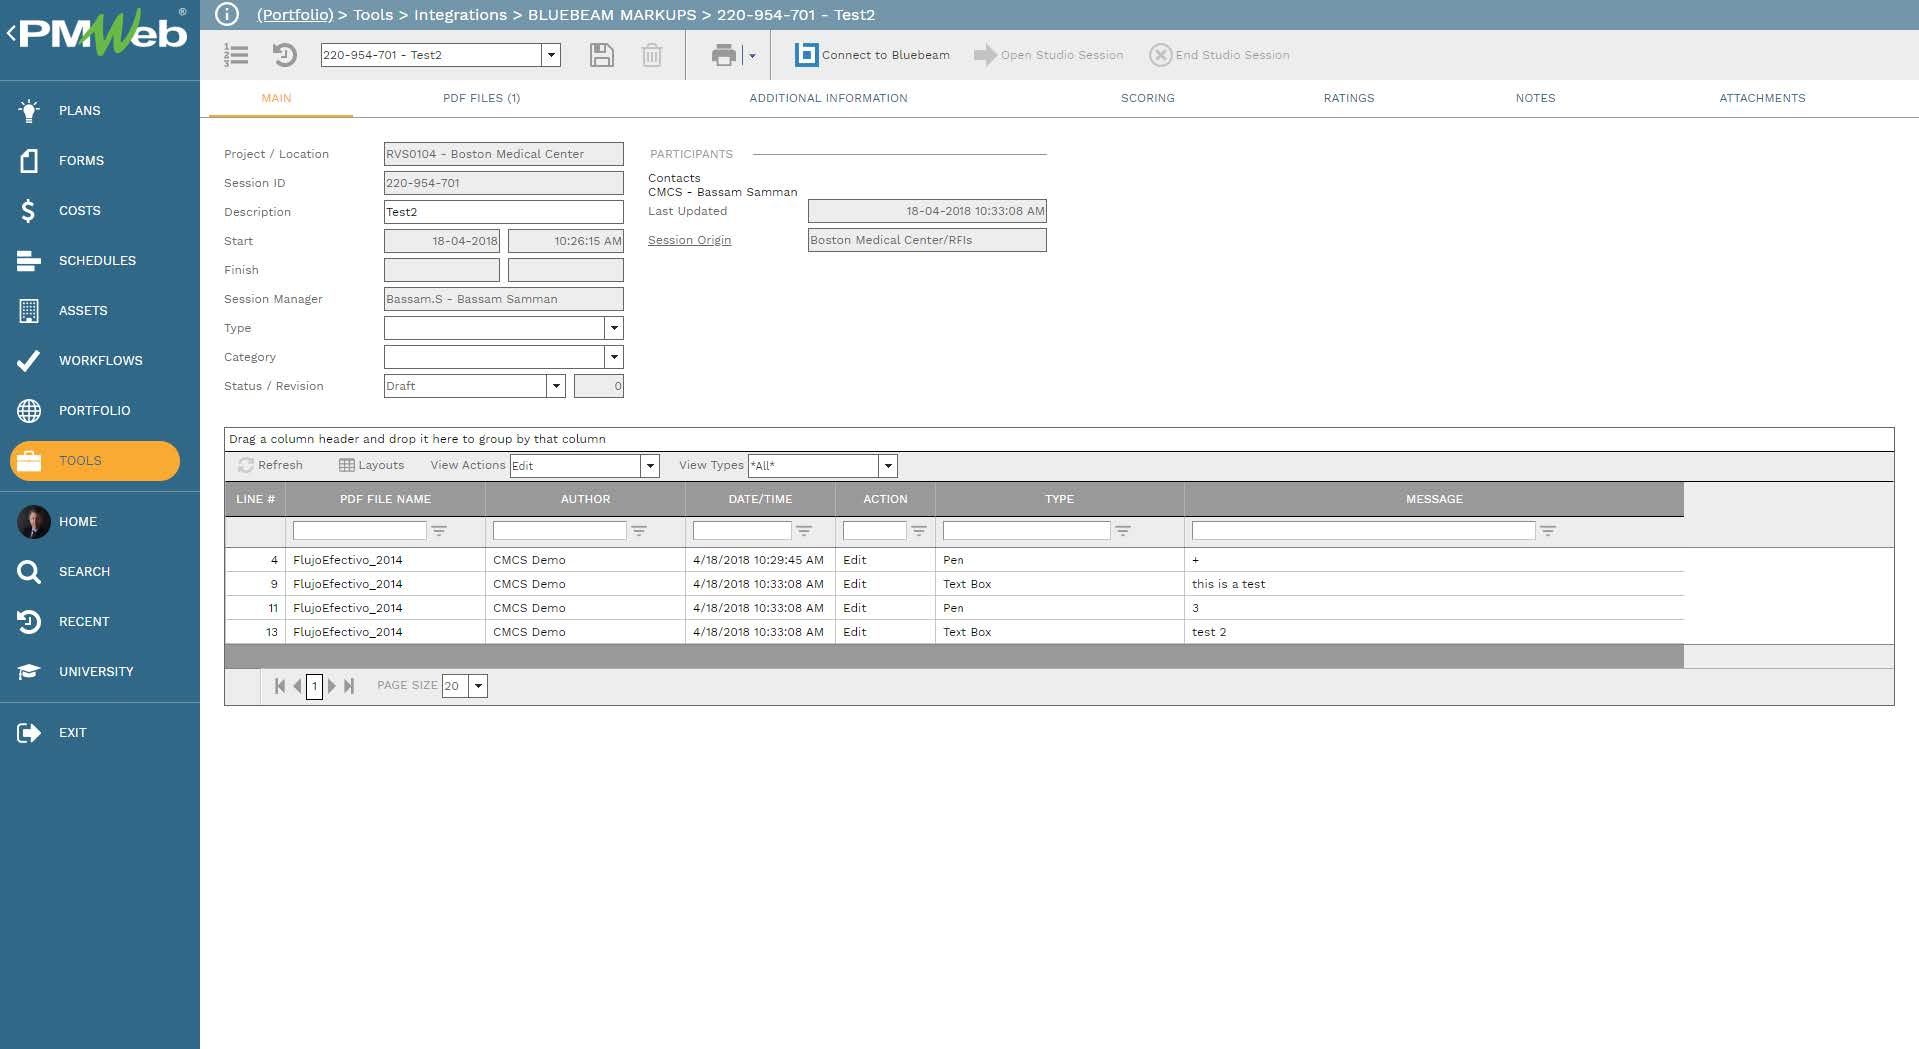 PMWeb 7 Tools Integration Bluebeam Markups Main